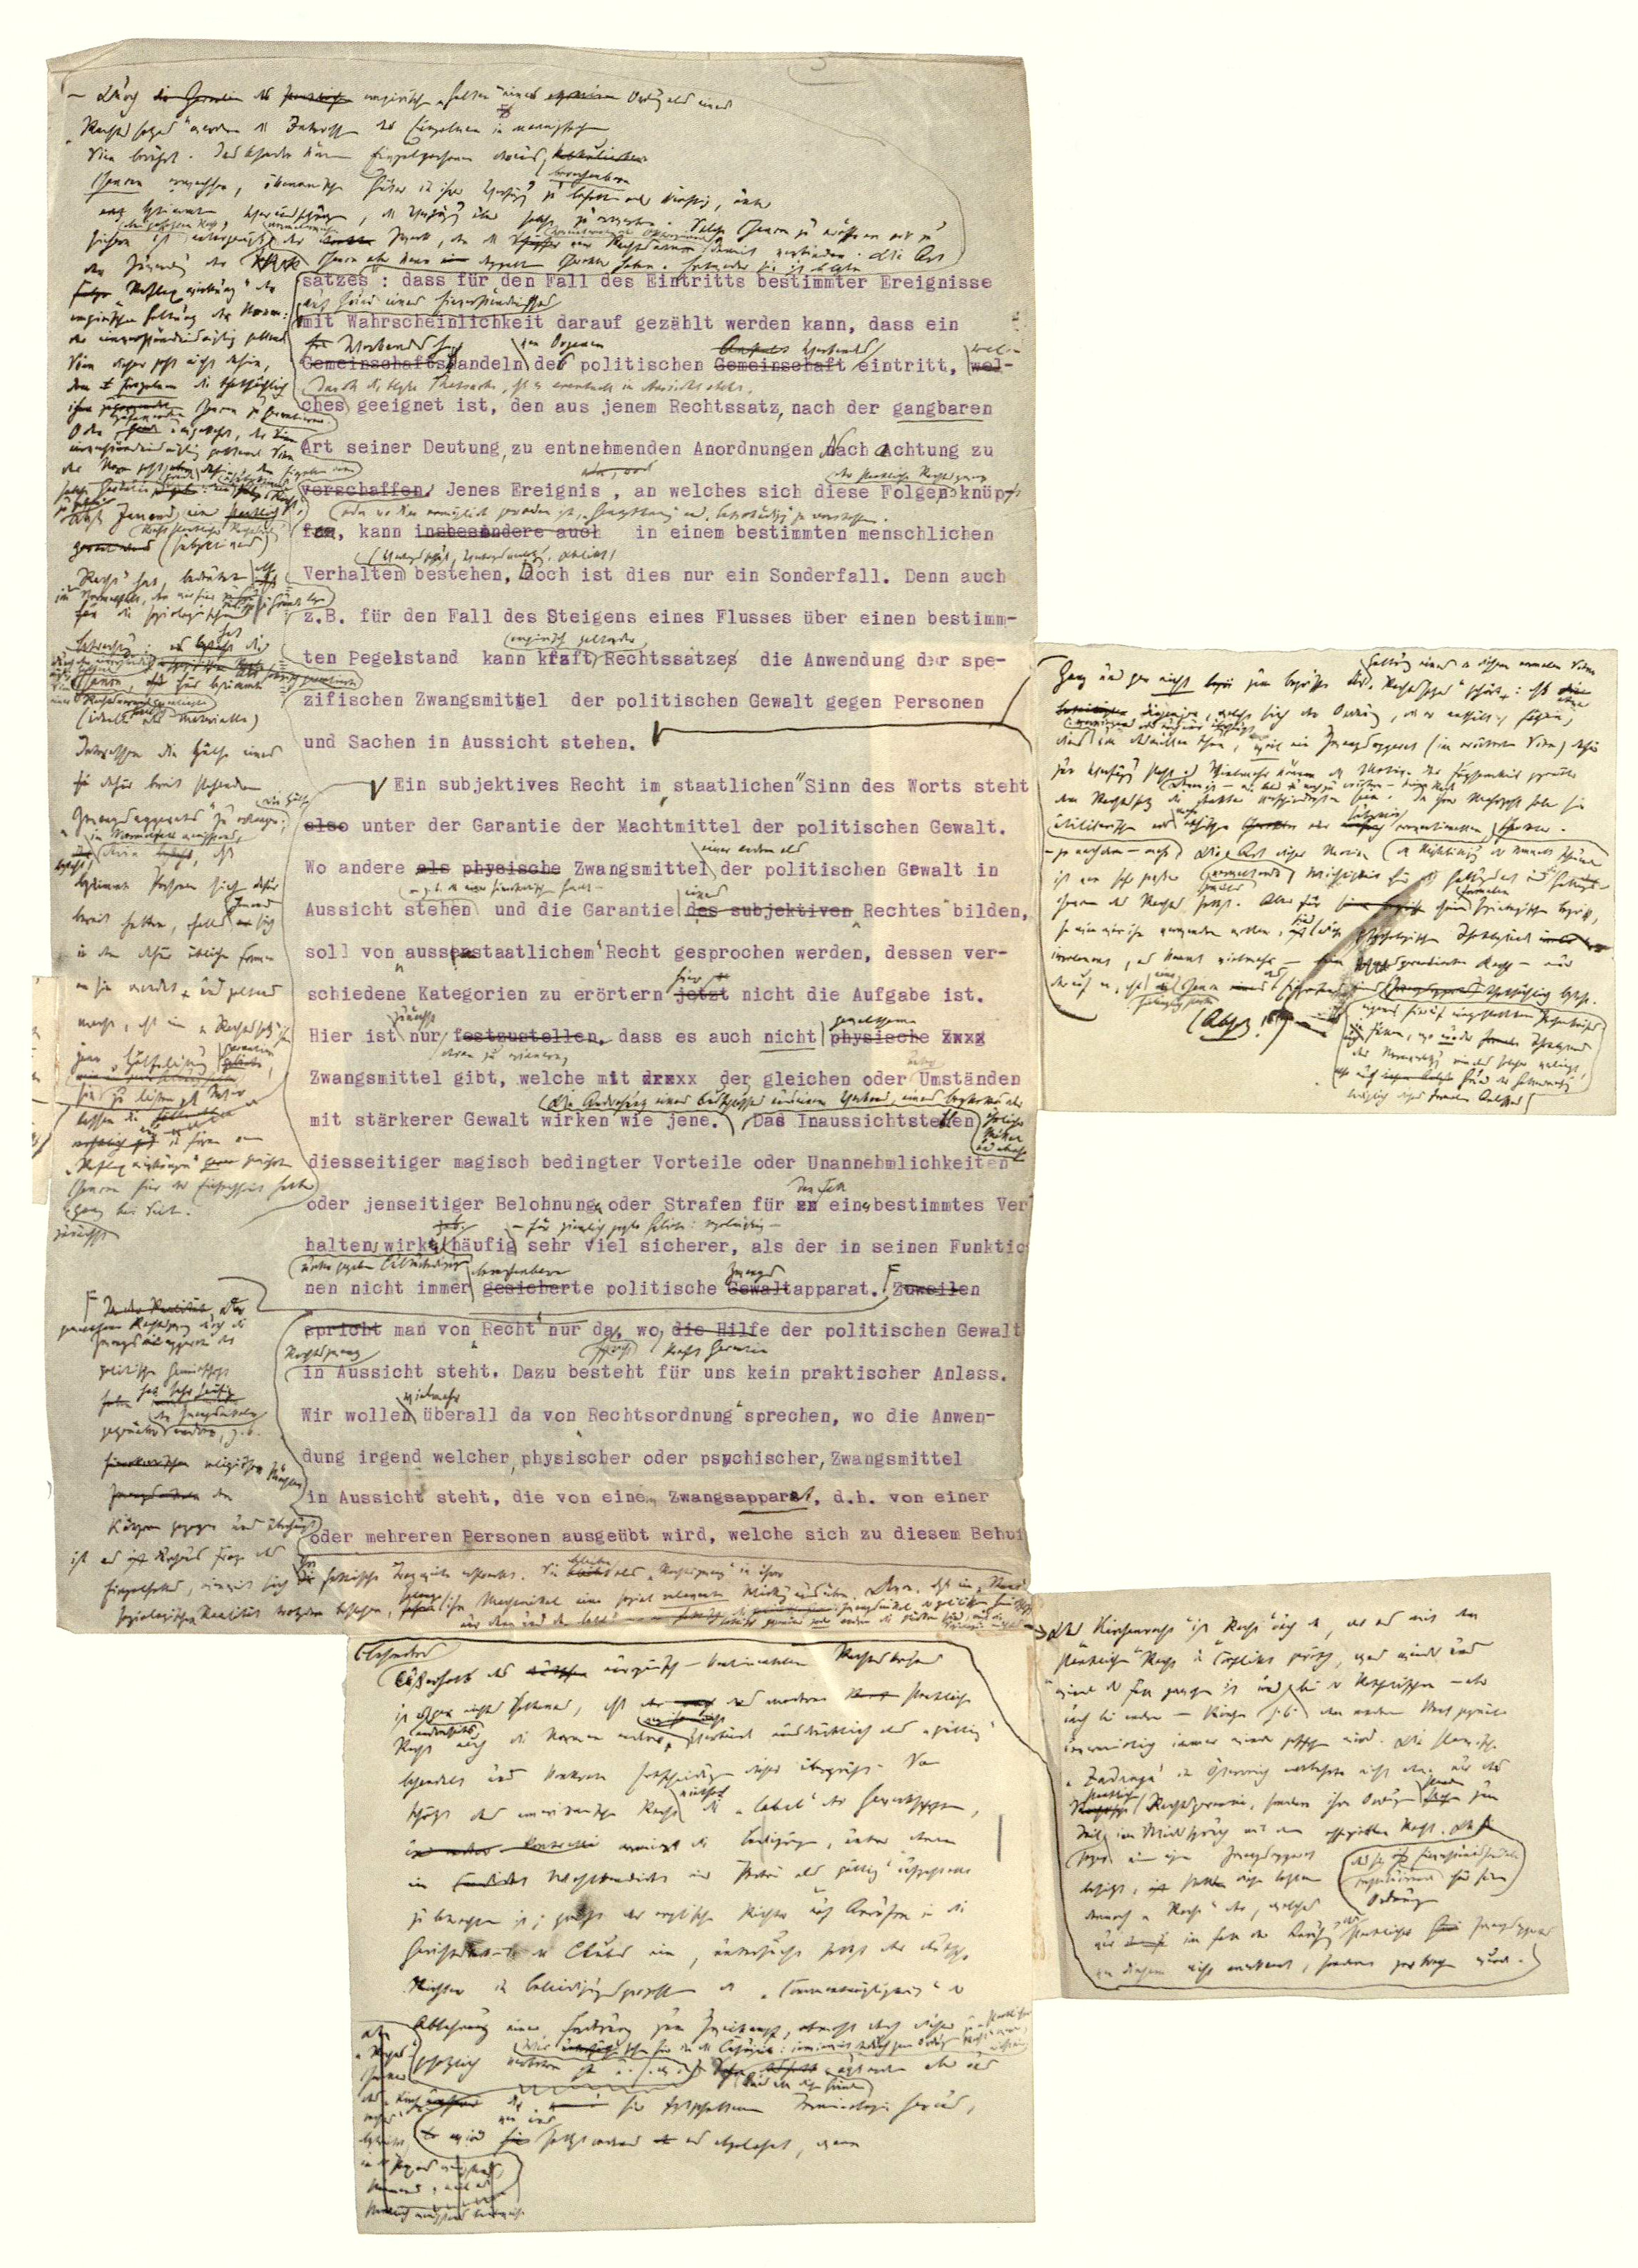 https://upload.wikimedia.org/wikipedia/commons/0/0b/Manuskript_max_weber_rechtssoziologie.jpg